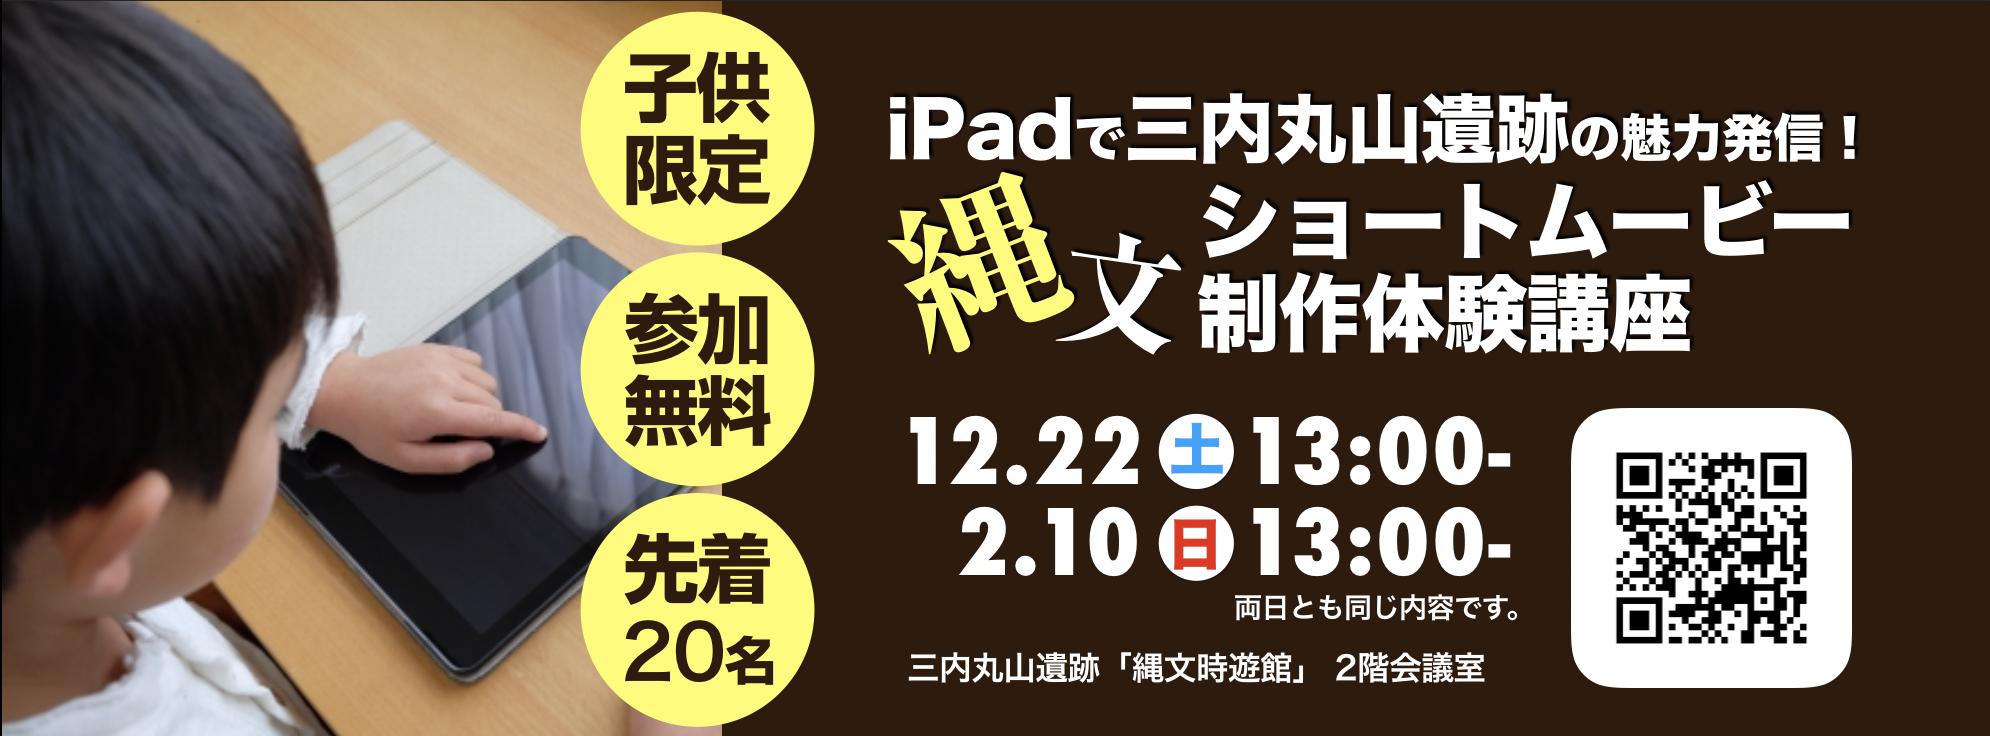 iPadで三内丸山遺跡の魅力発信!縄文ショートムービー制作体験講座